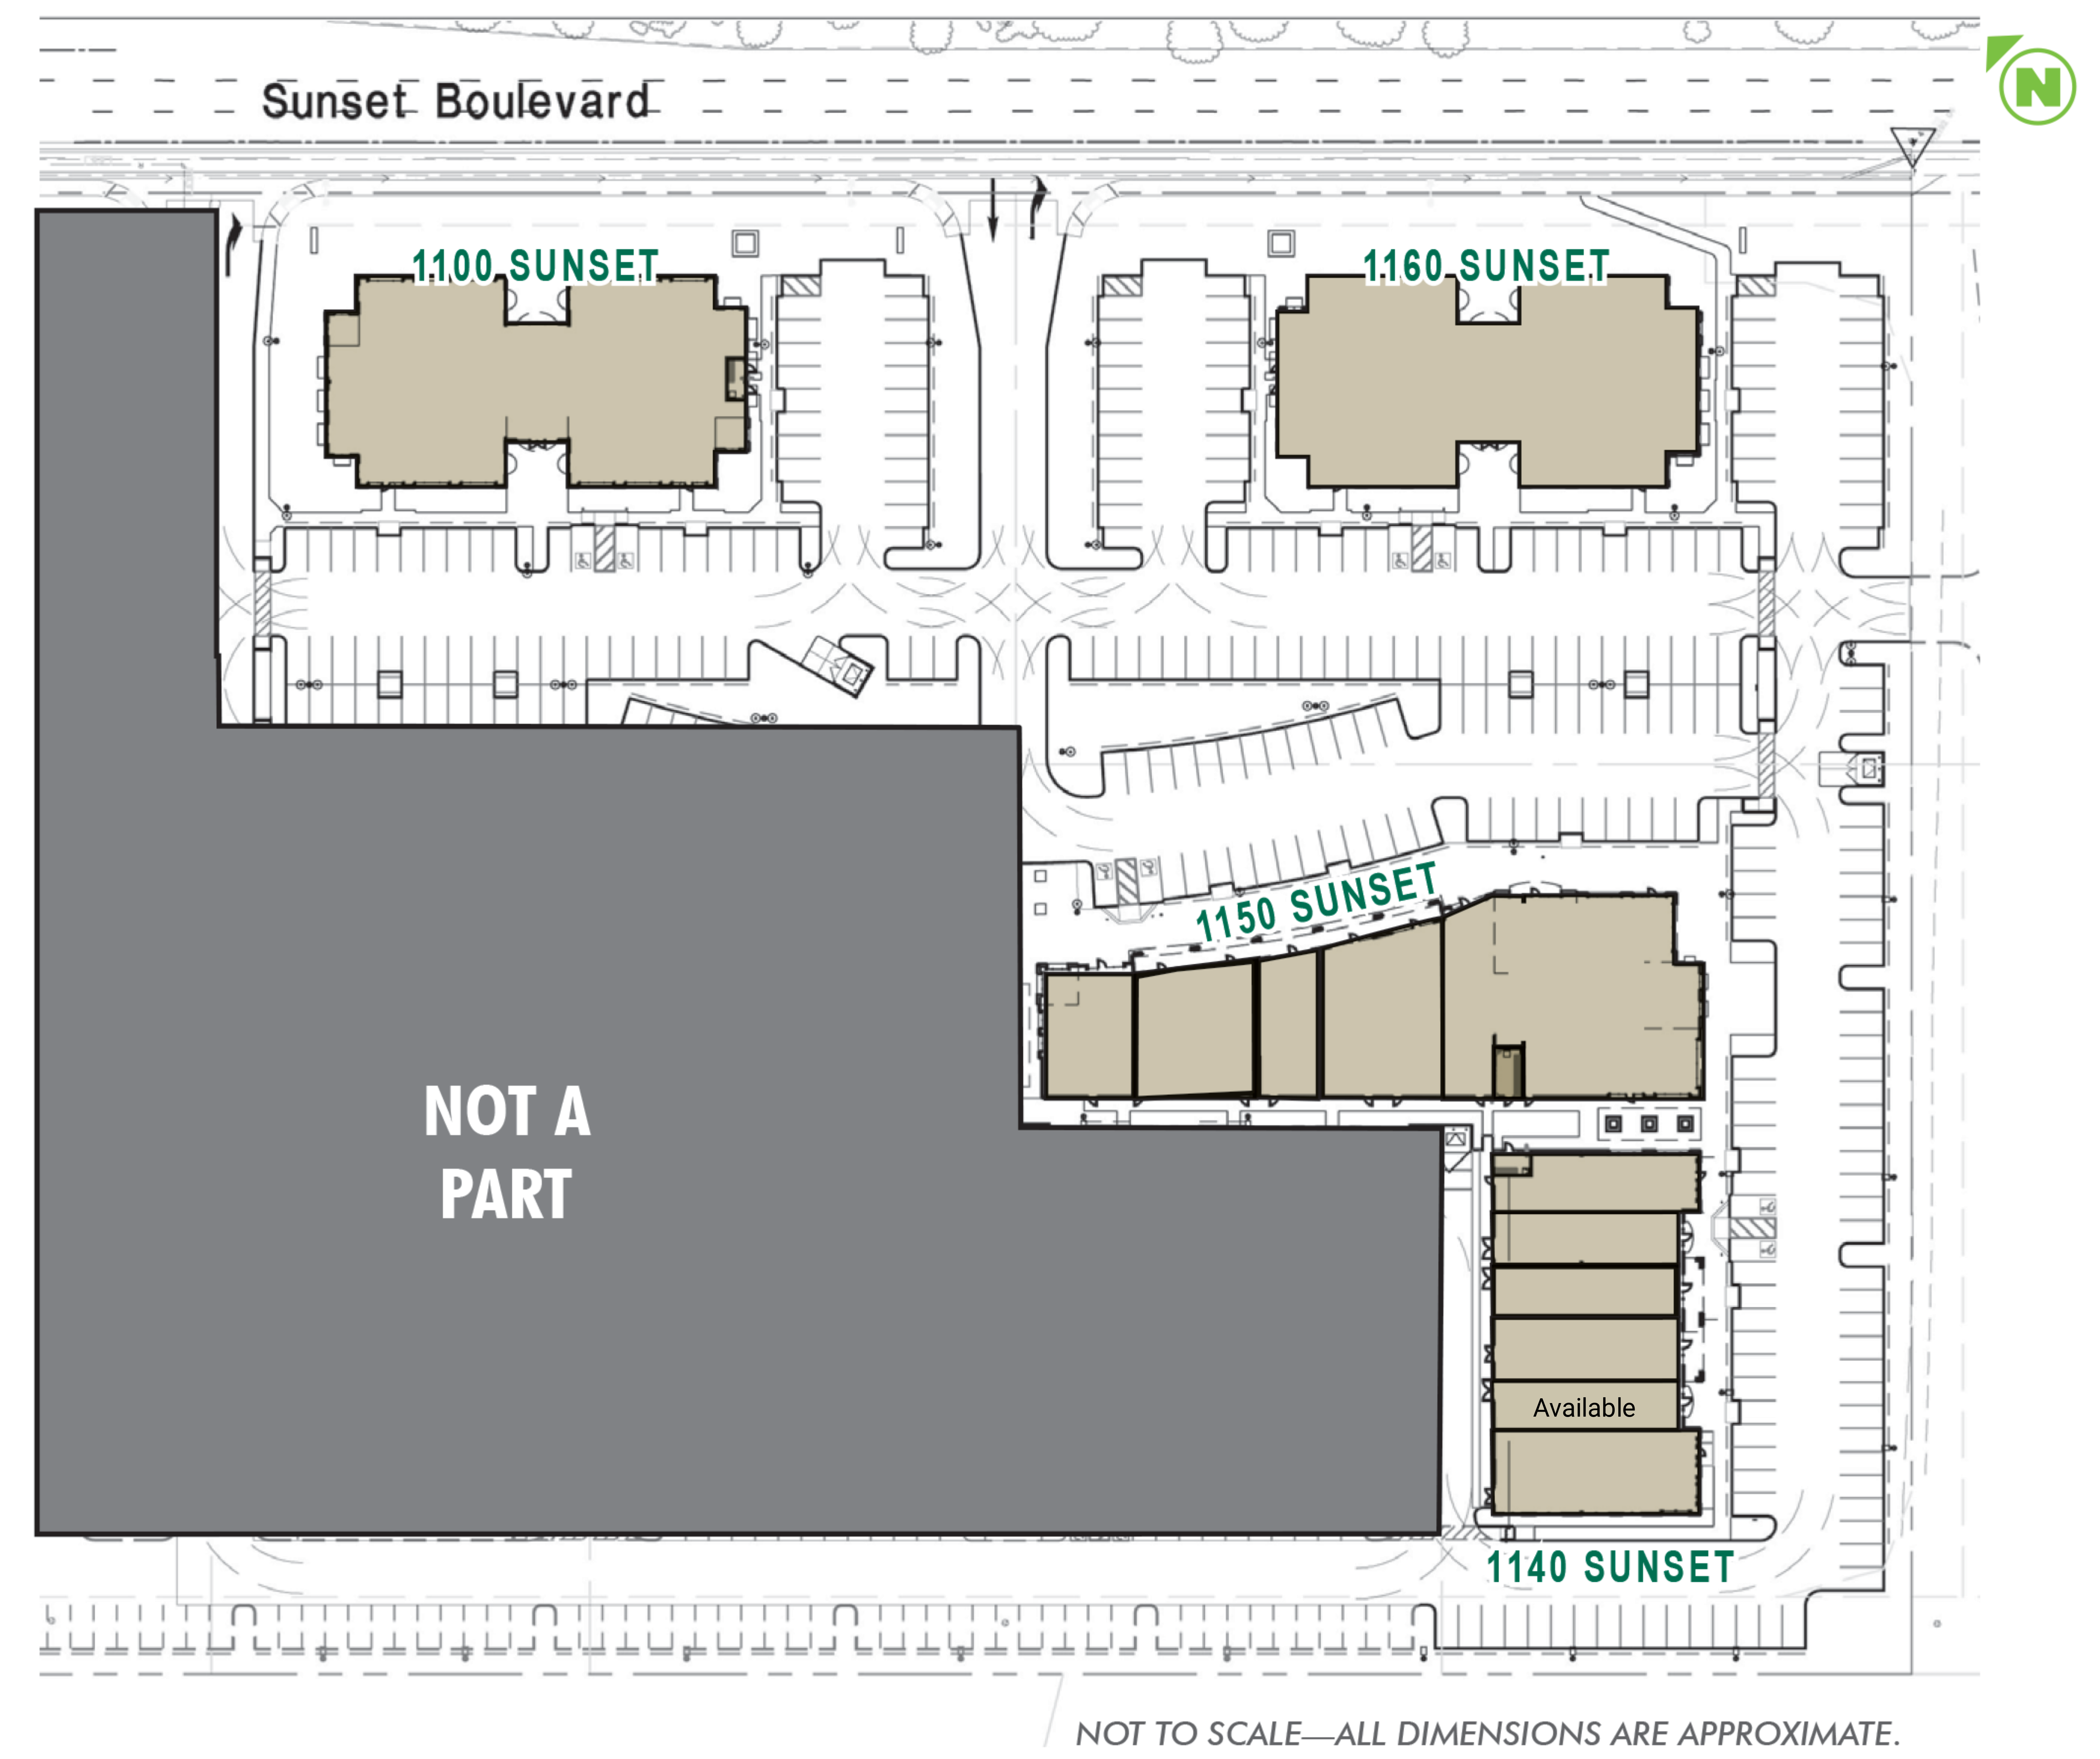 Sunset West Retail: site plan